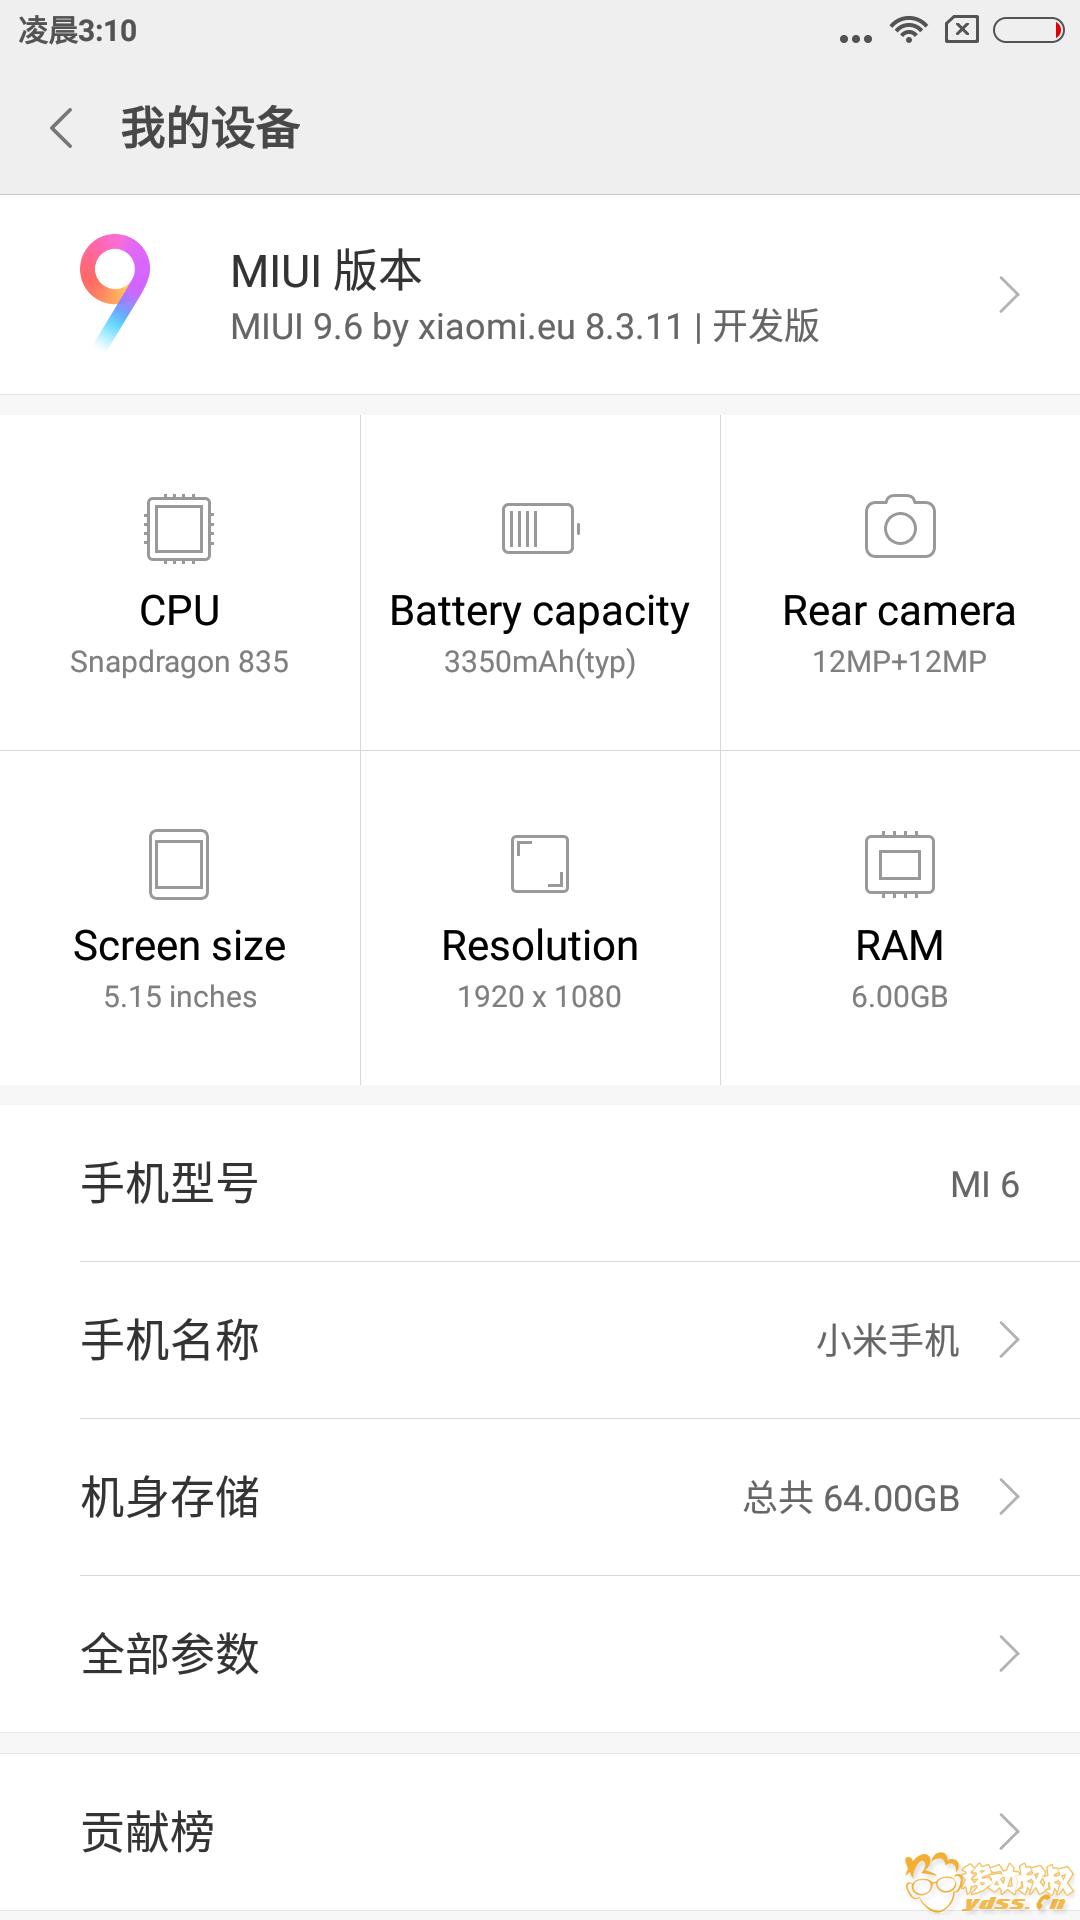 Screenshot_2018-03-11-03-10-27-264_com.android.se.png